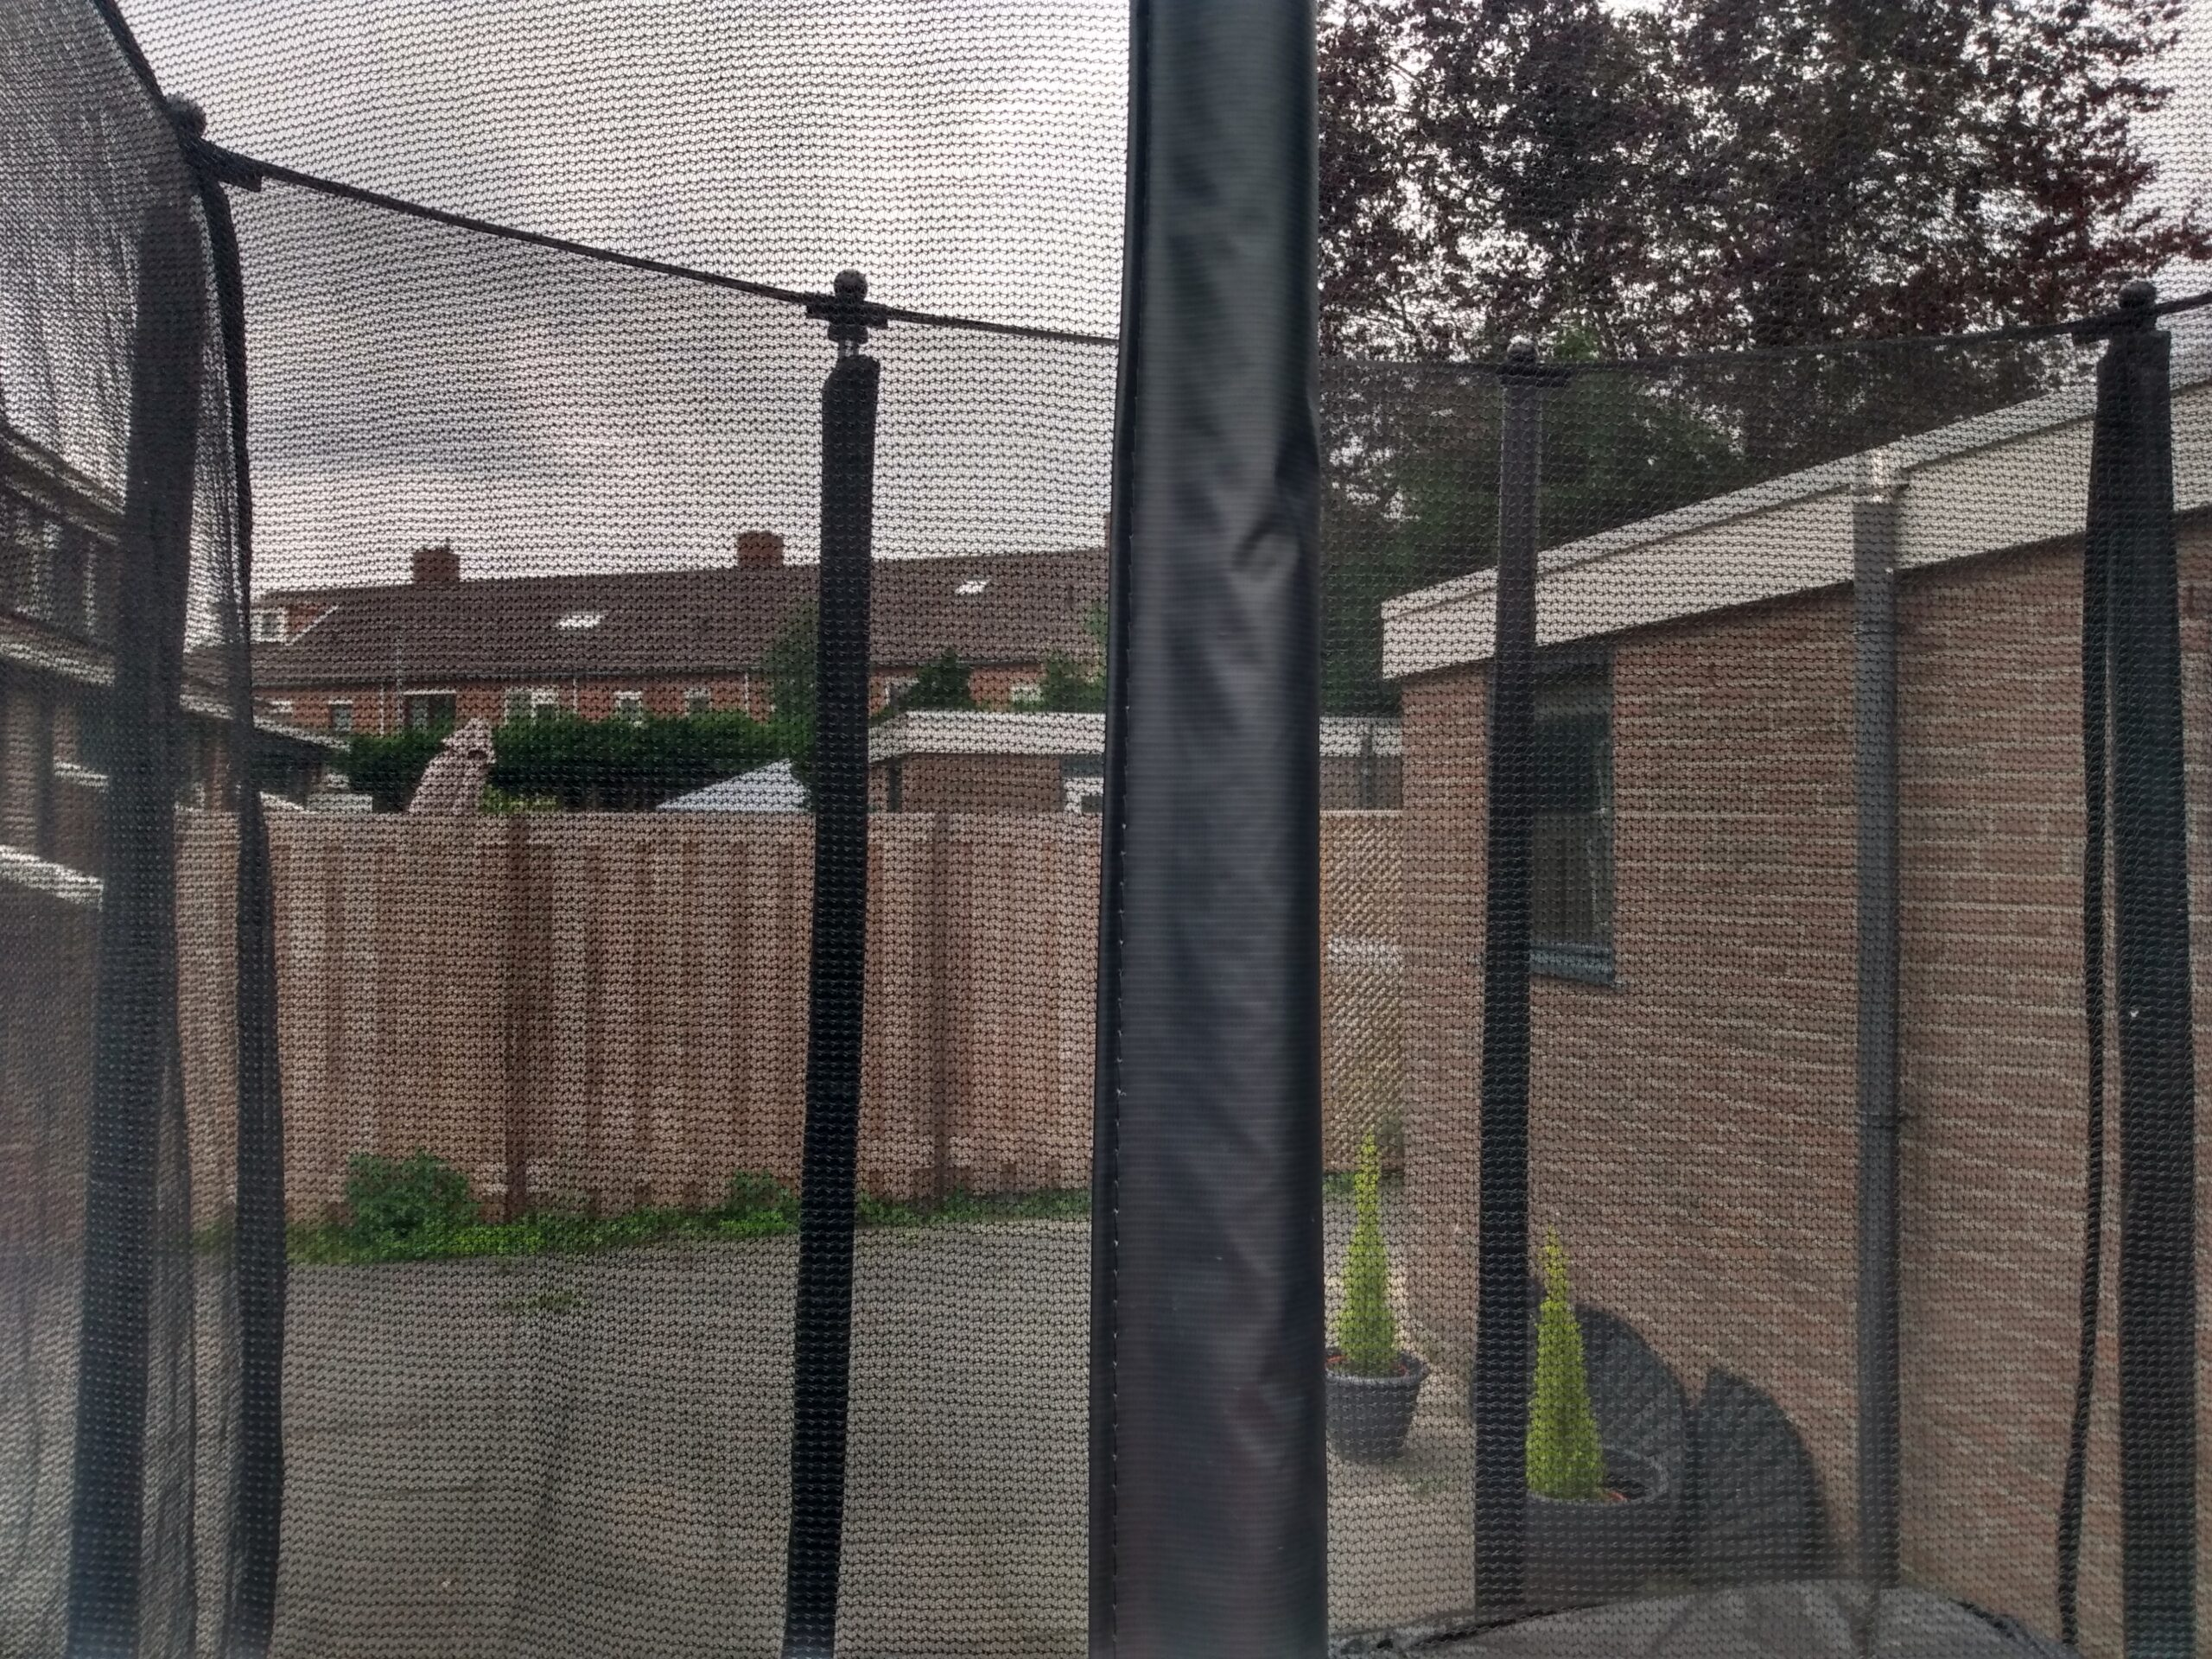 Trampolines kom je in vrijwel iedere achtertuin tegen. Maar welke kies je? Foto: S.v.d. Ent